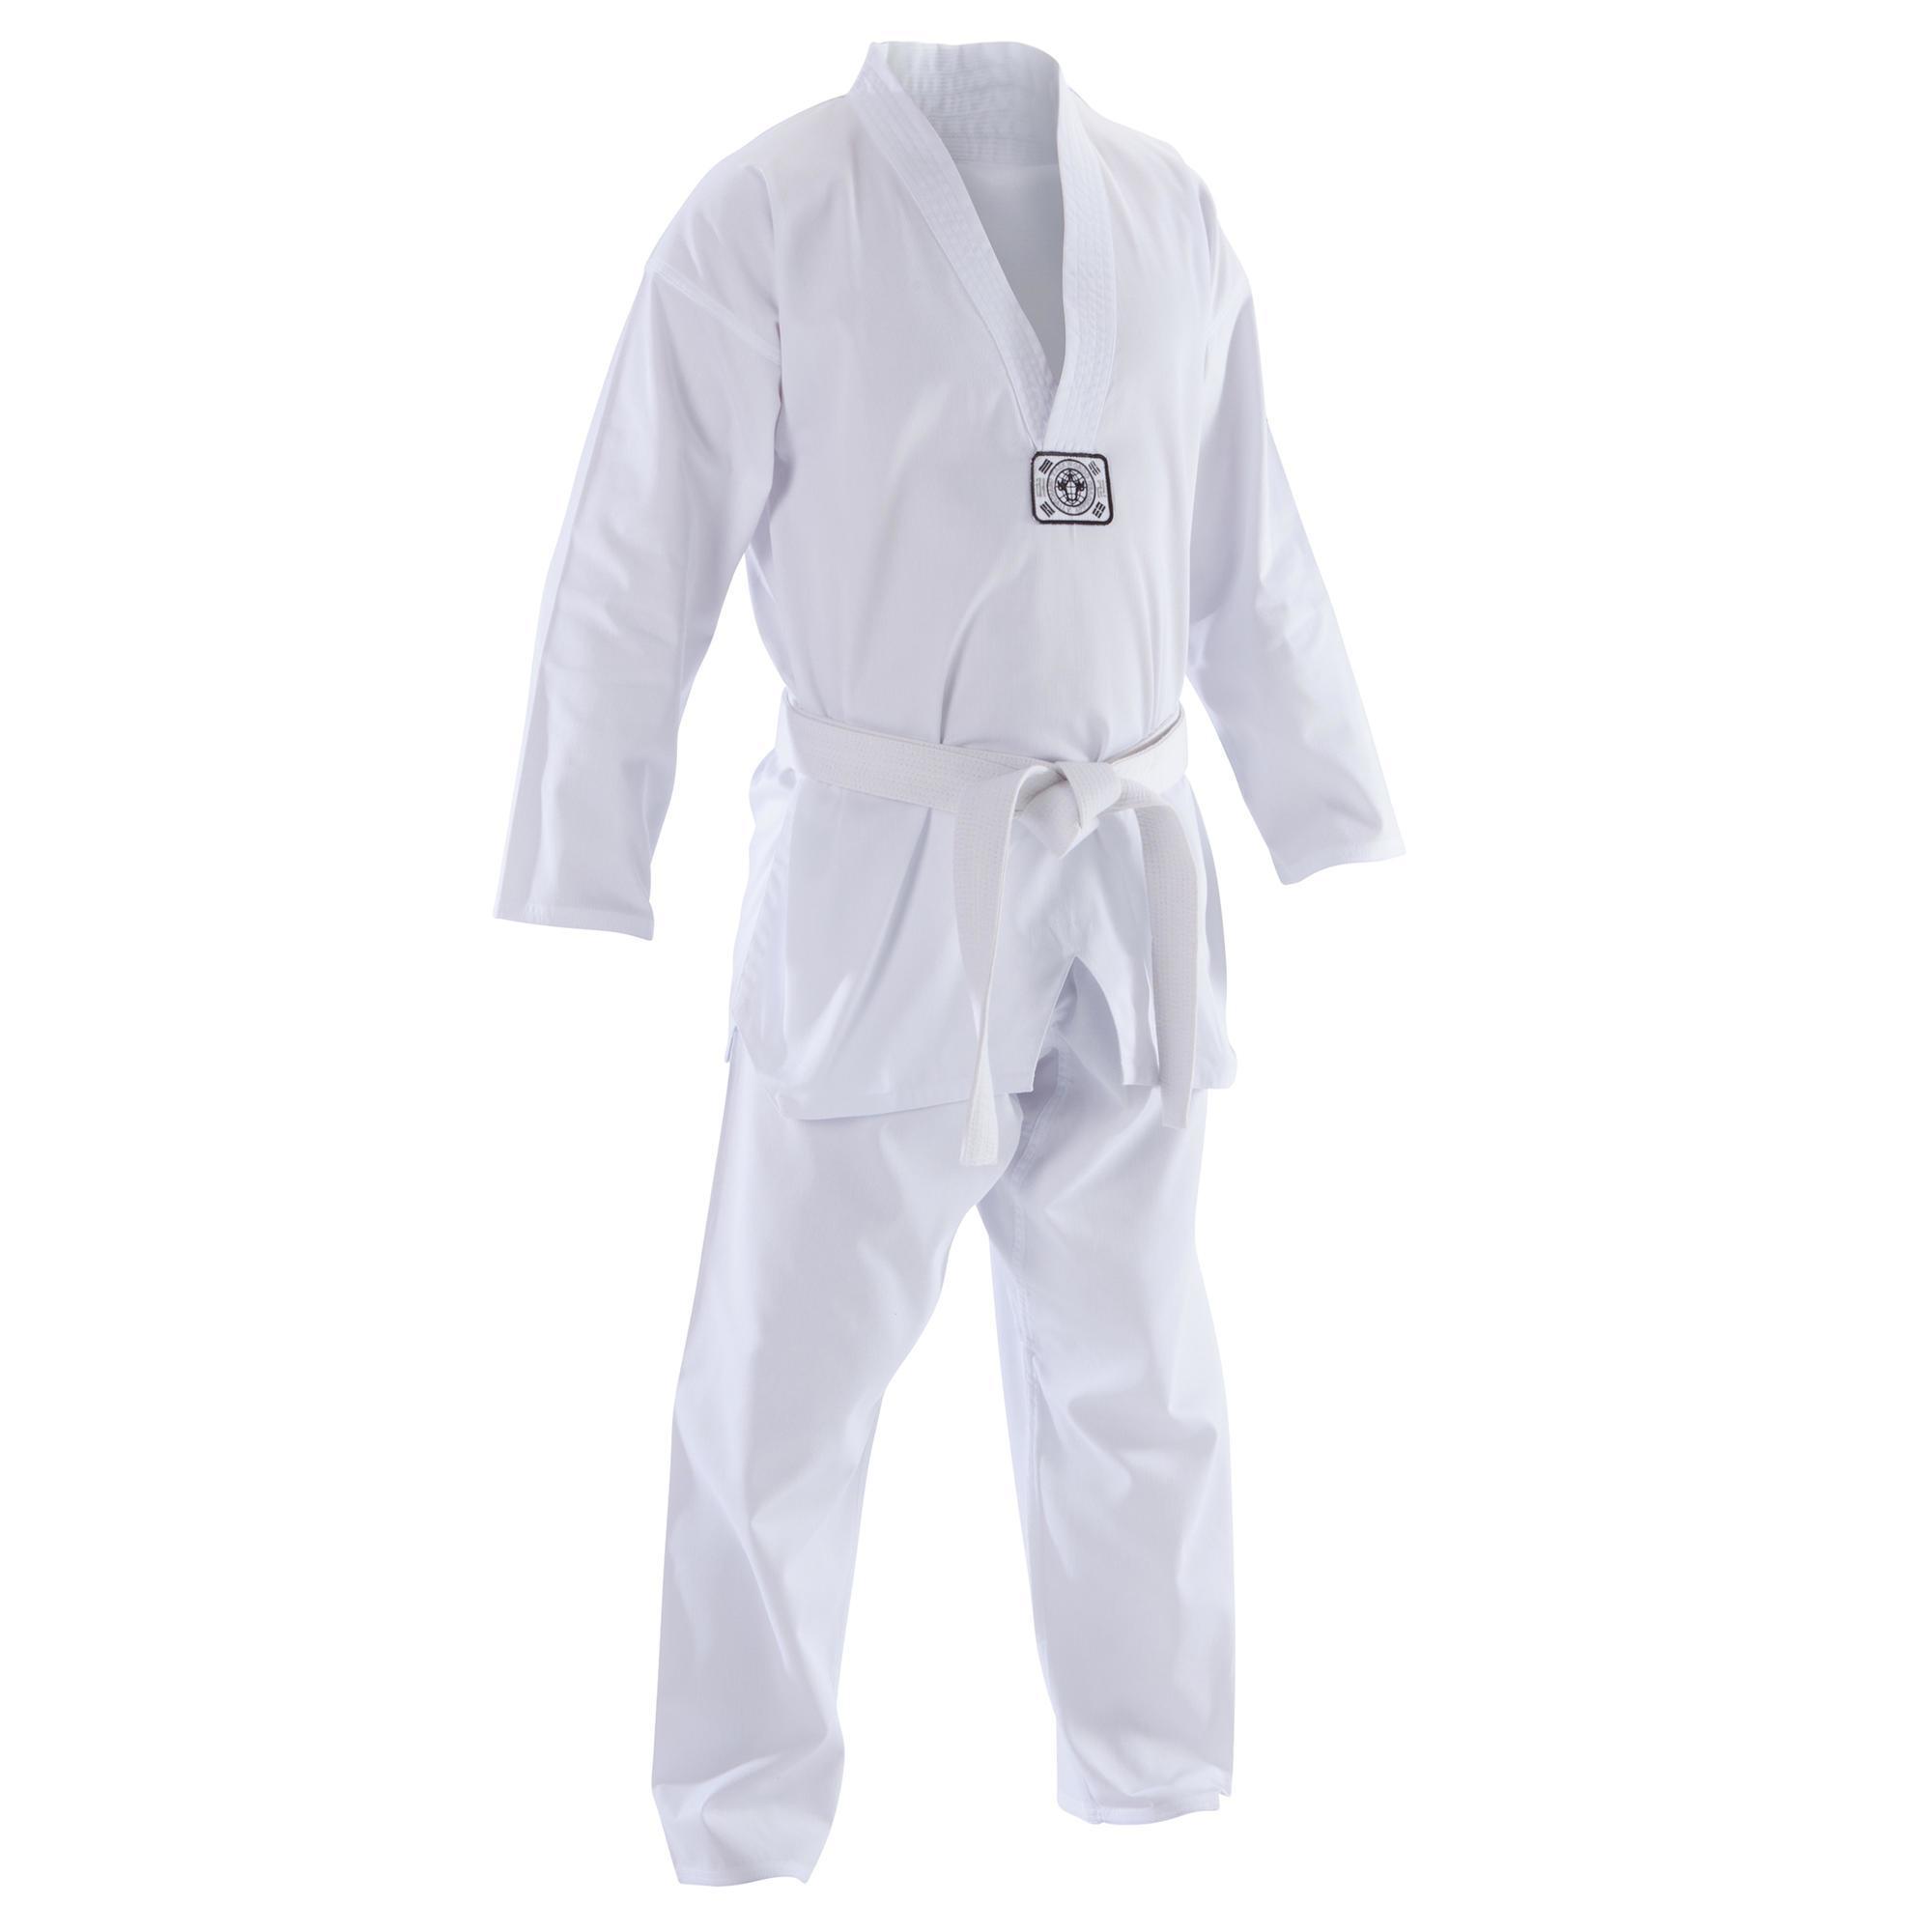 Taekwondo-Anzug 500 Erwachsene | Sportbekleidung > Sportanzüge > Taekwondo-Anzüge | Outshock